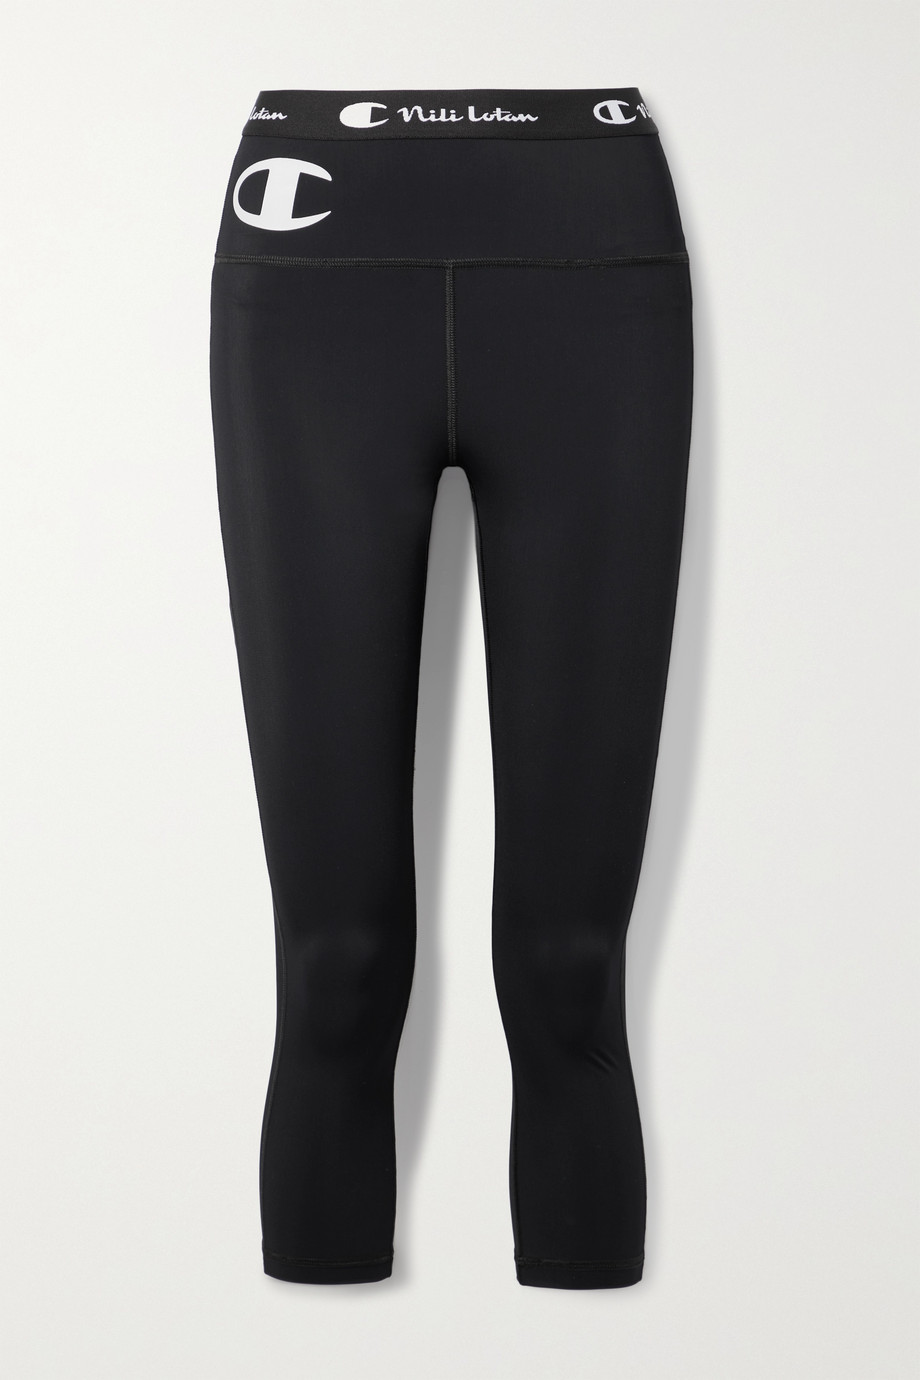 Nili Lotan + Champion printed stretch leggings